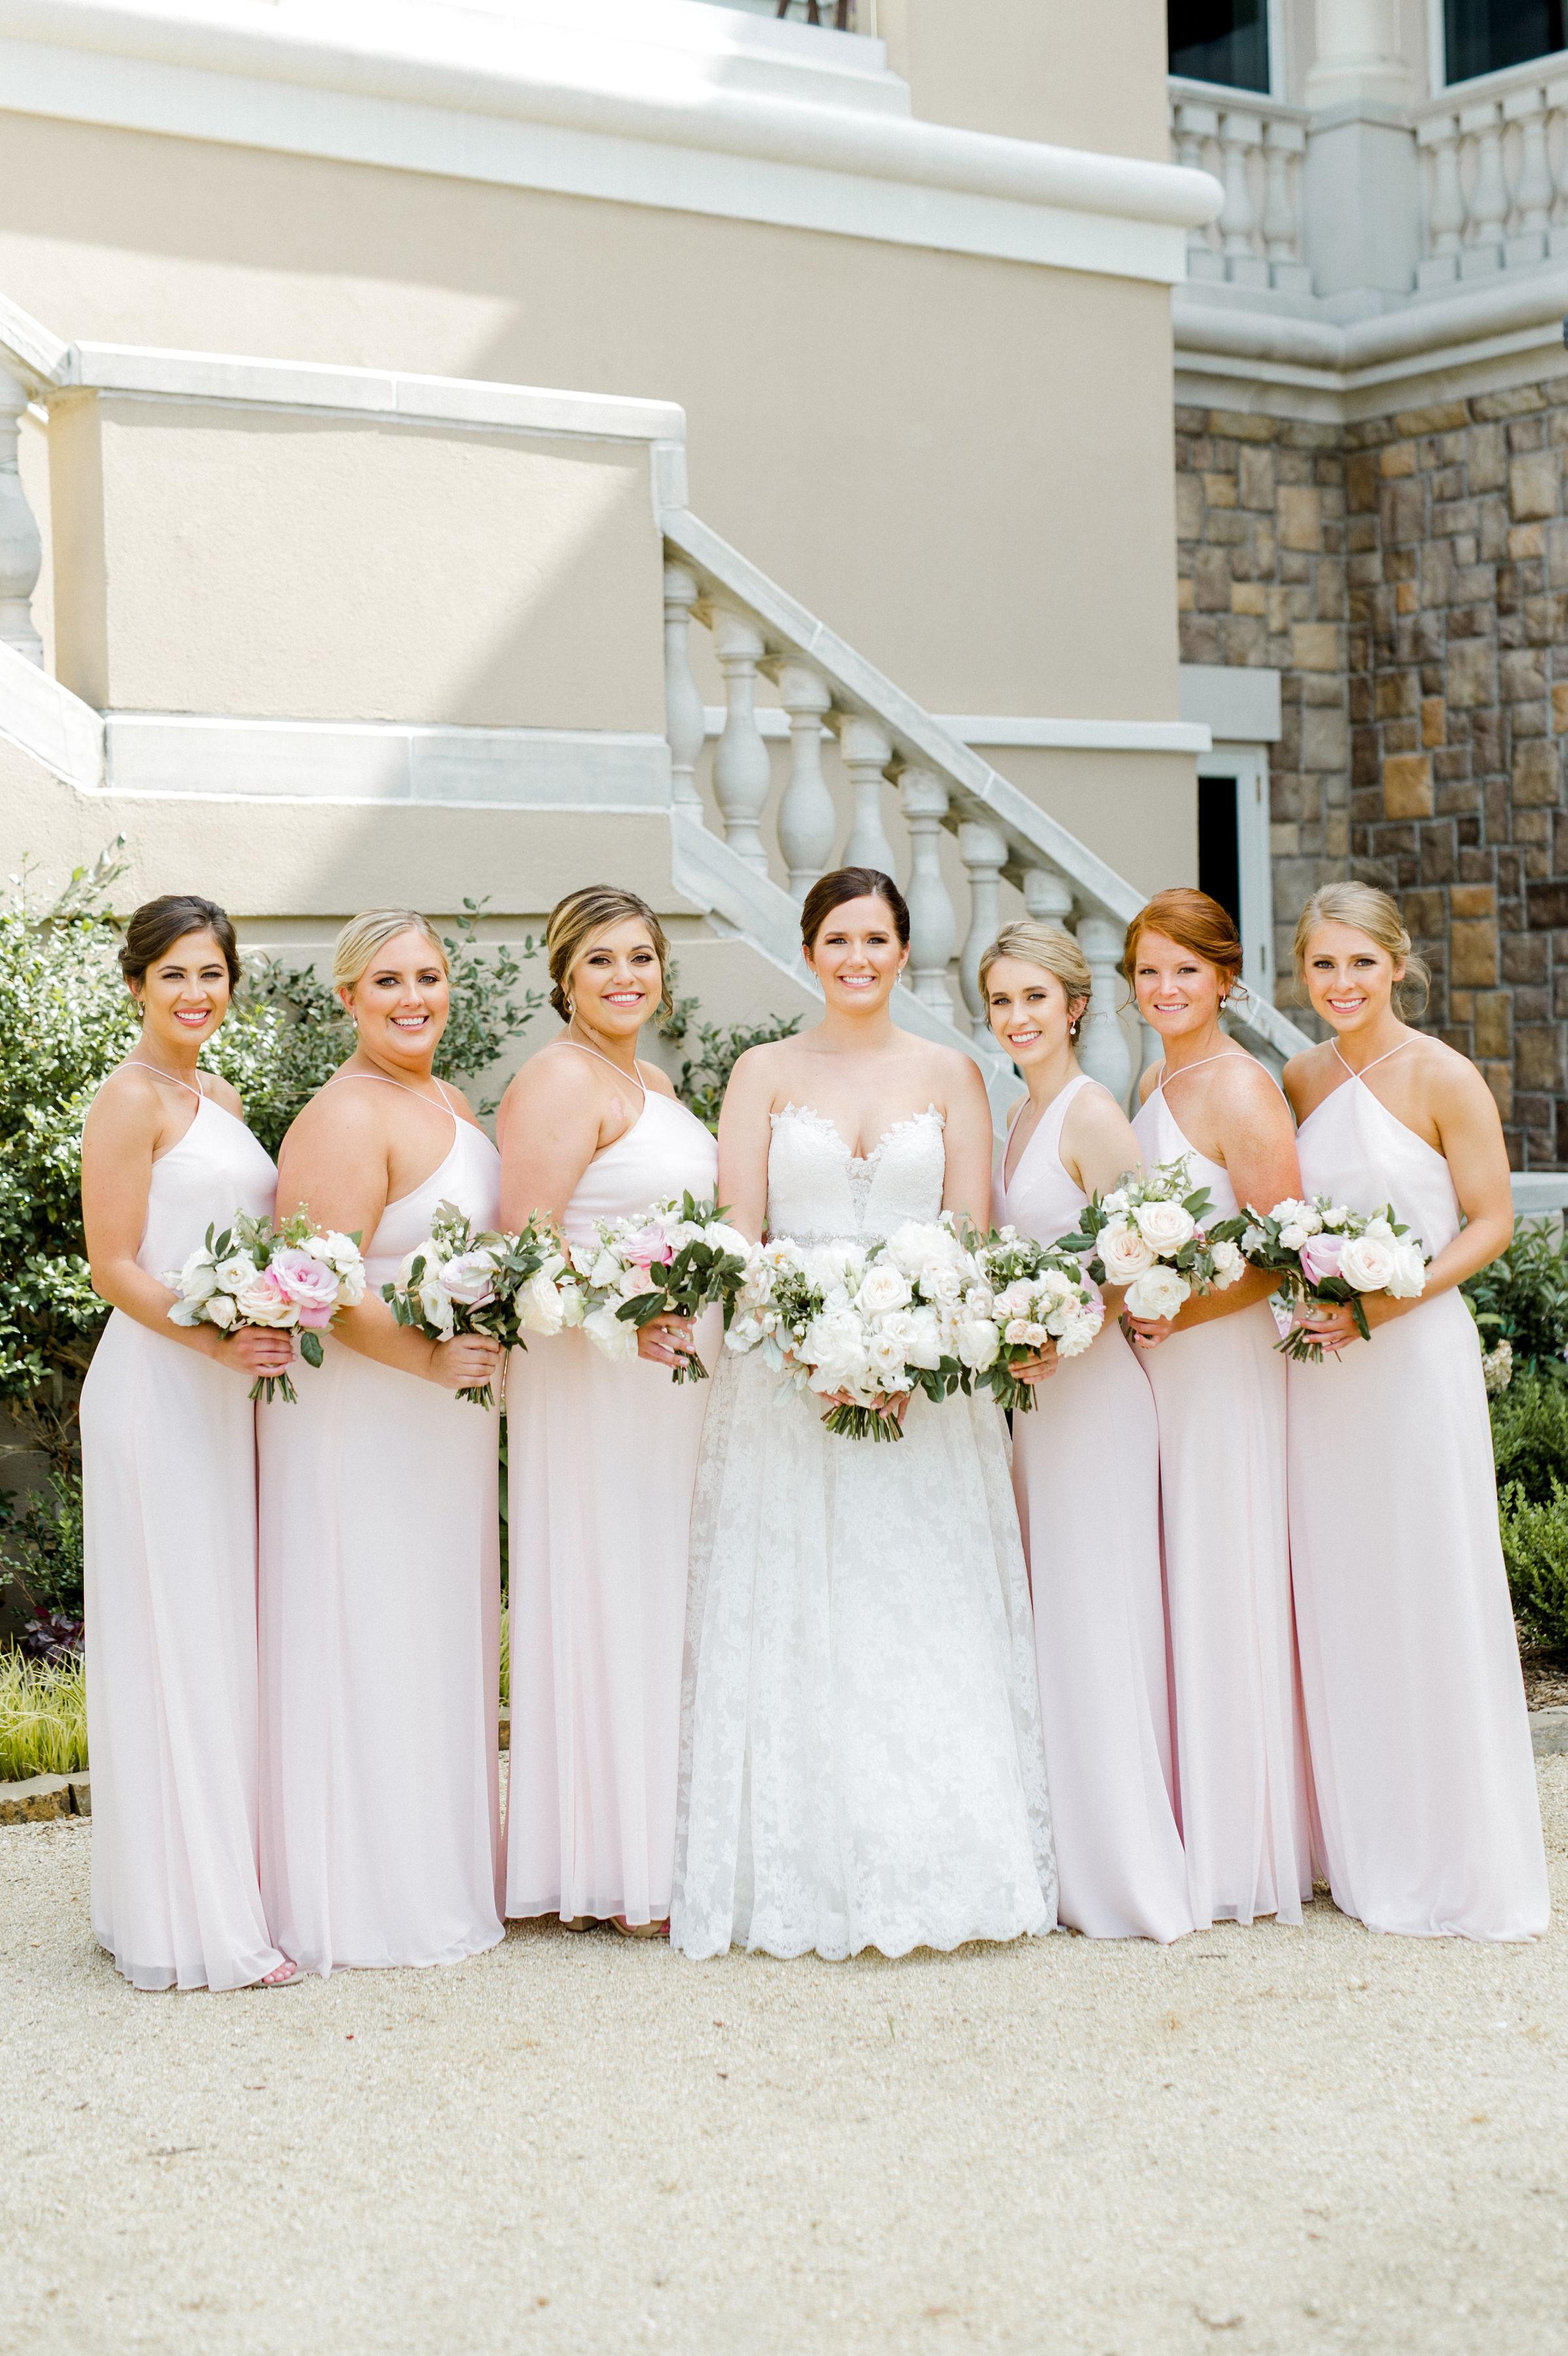 McElravey_Wedding_CarolineLimaPhotography_2018_162.jpg